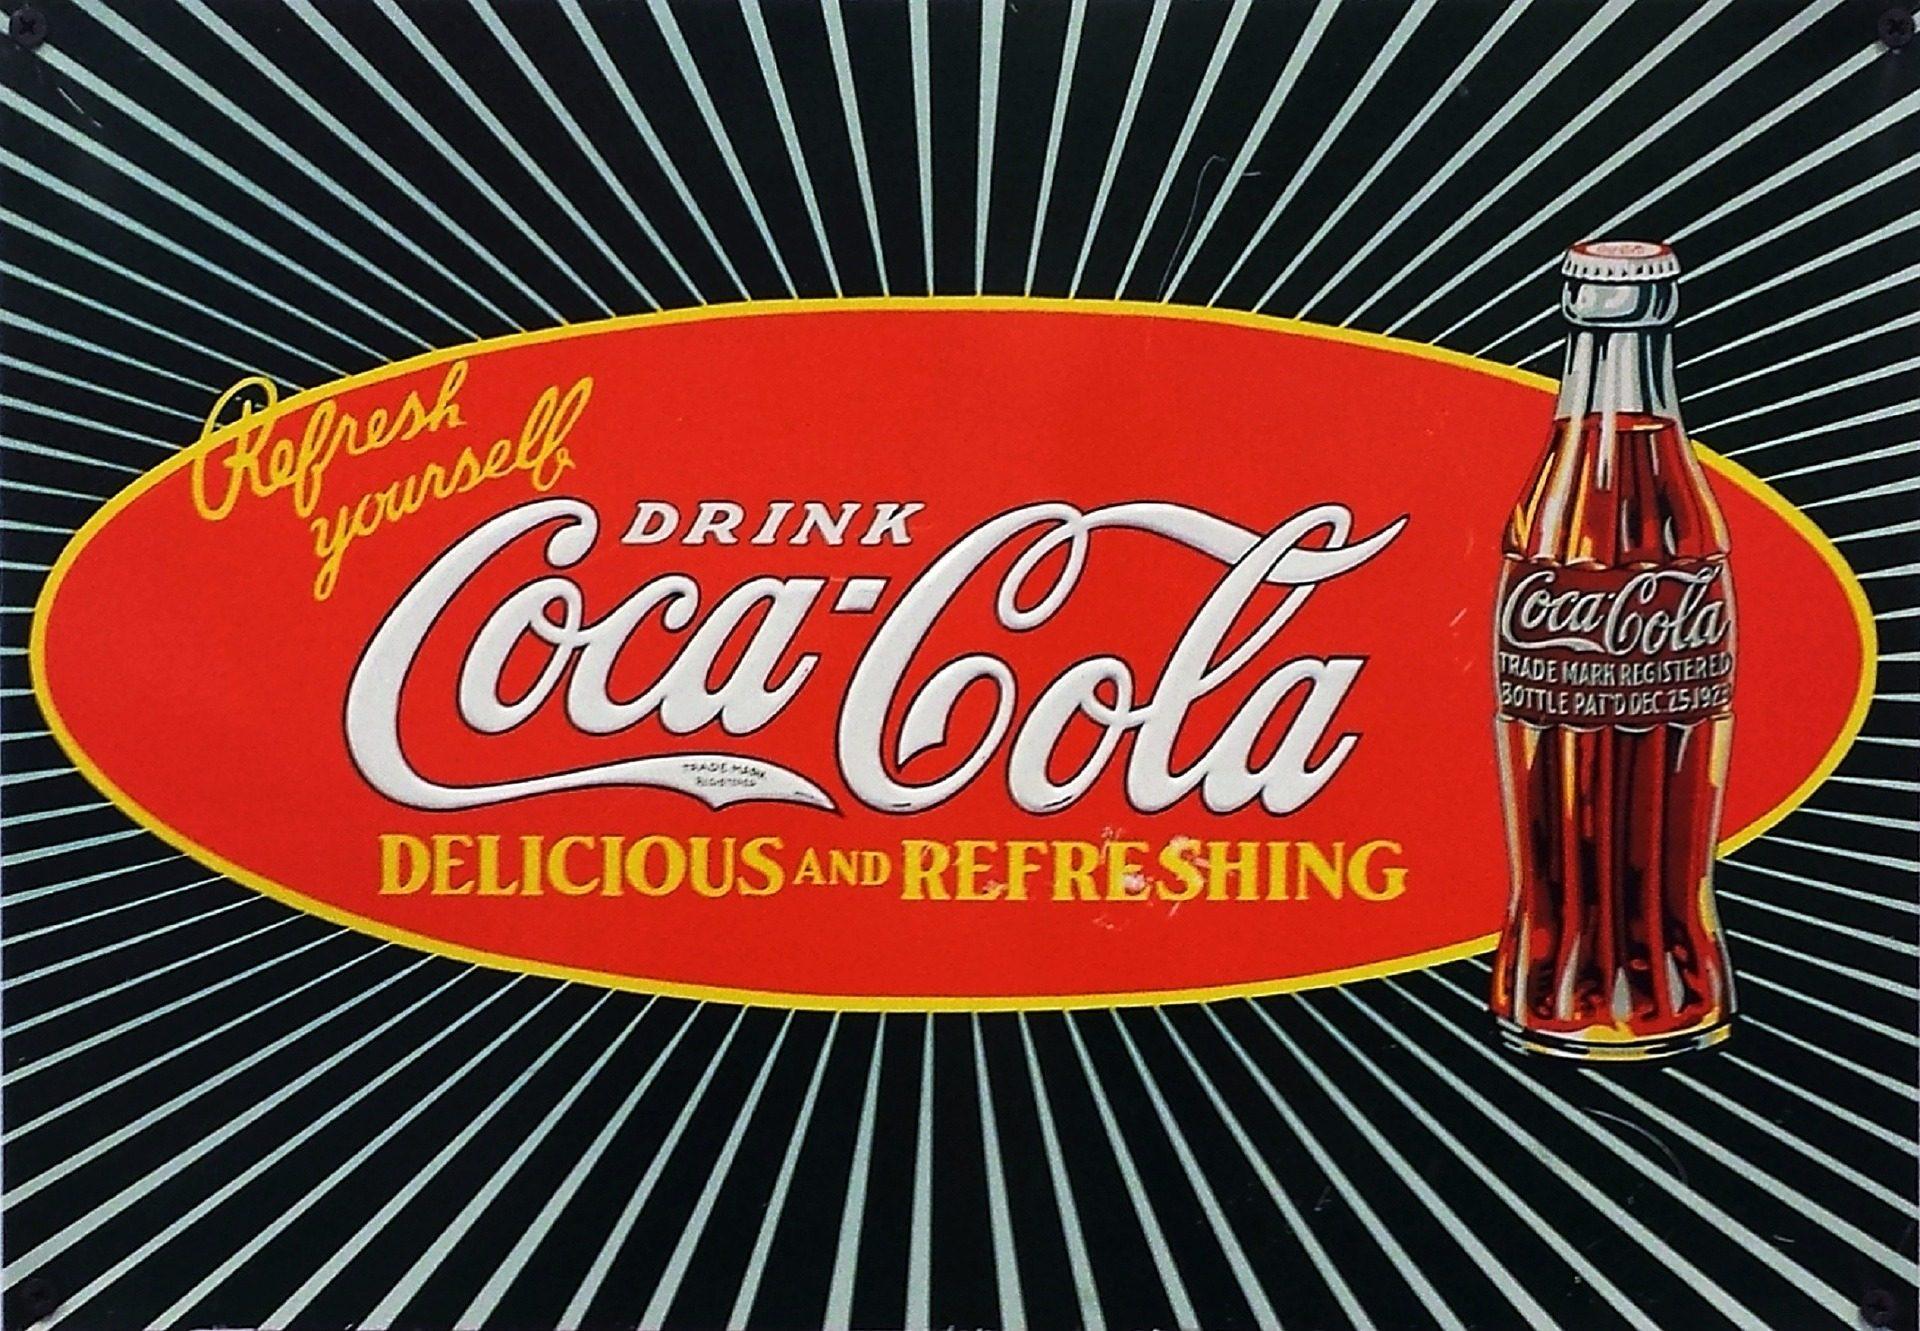 Coca Cola is hitting the hard stuff [watch]